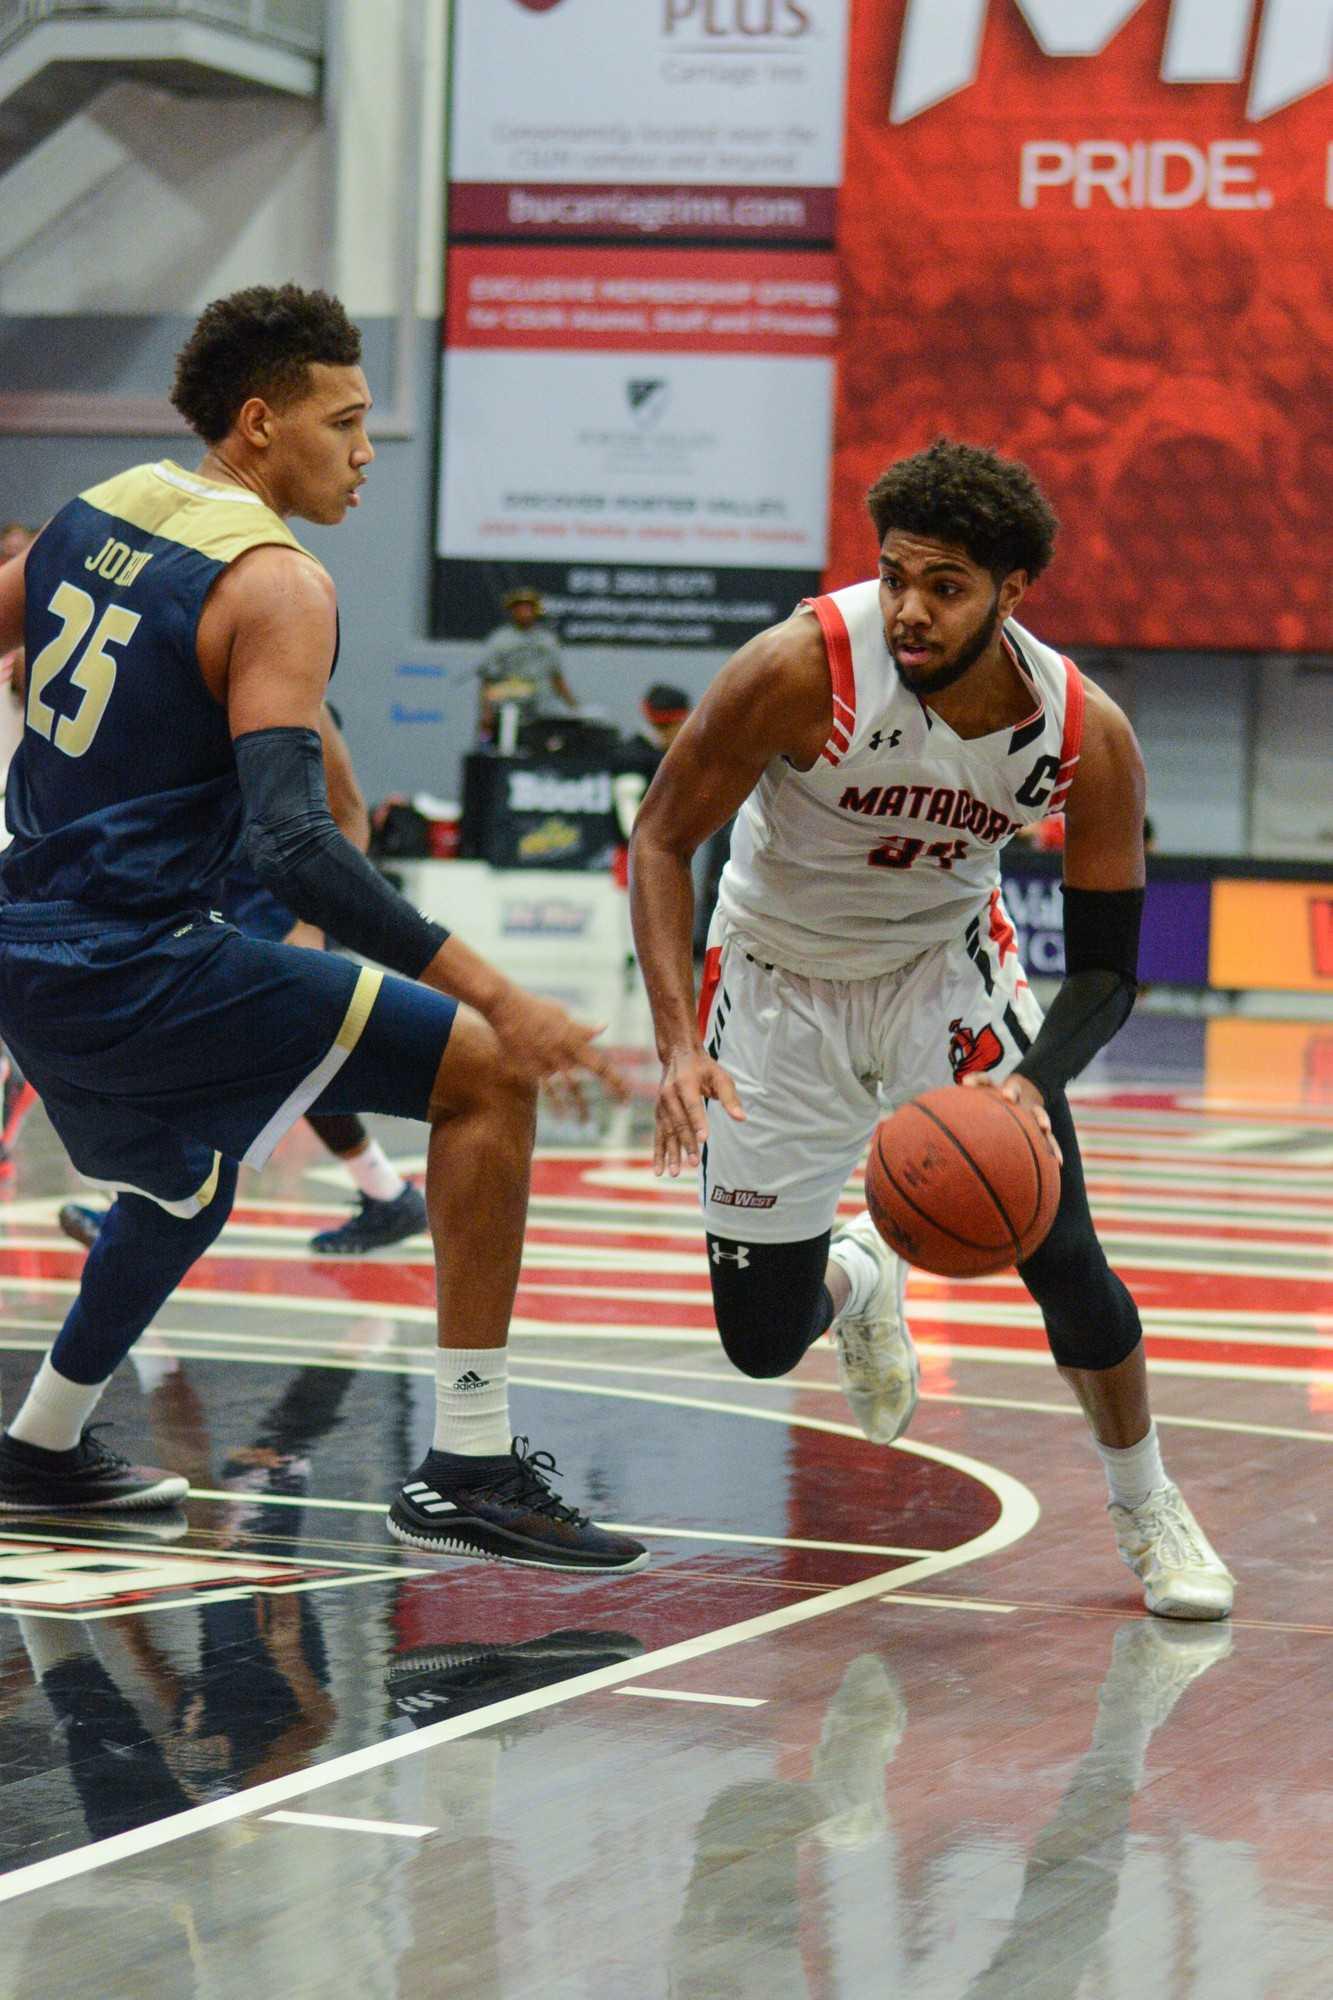 CSUN mens basketball player defending the ball